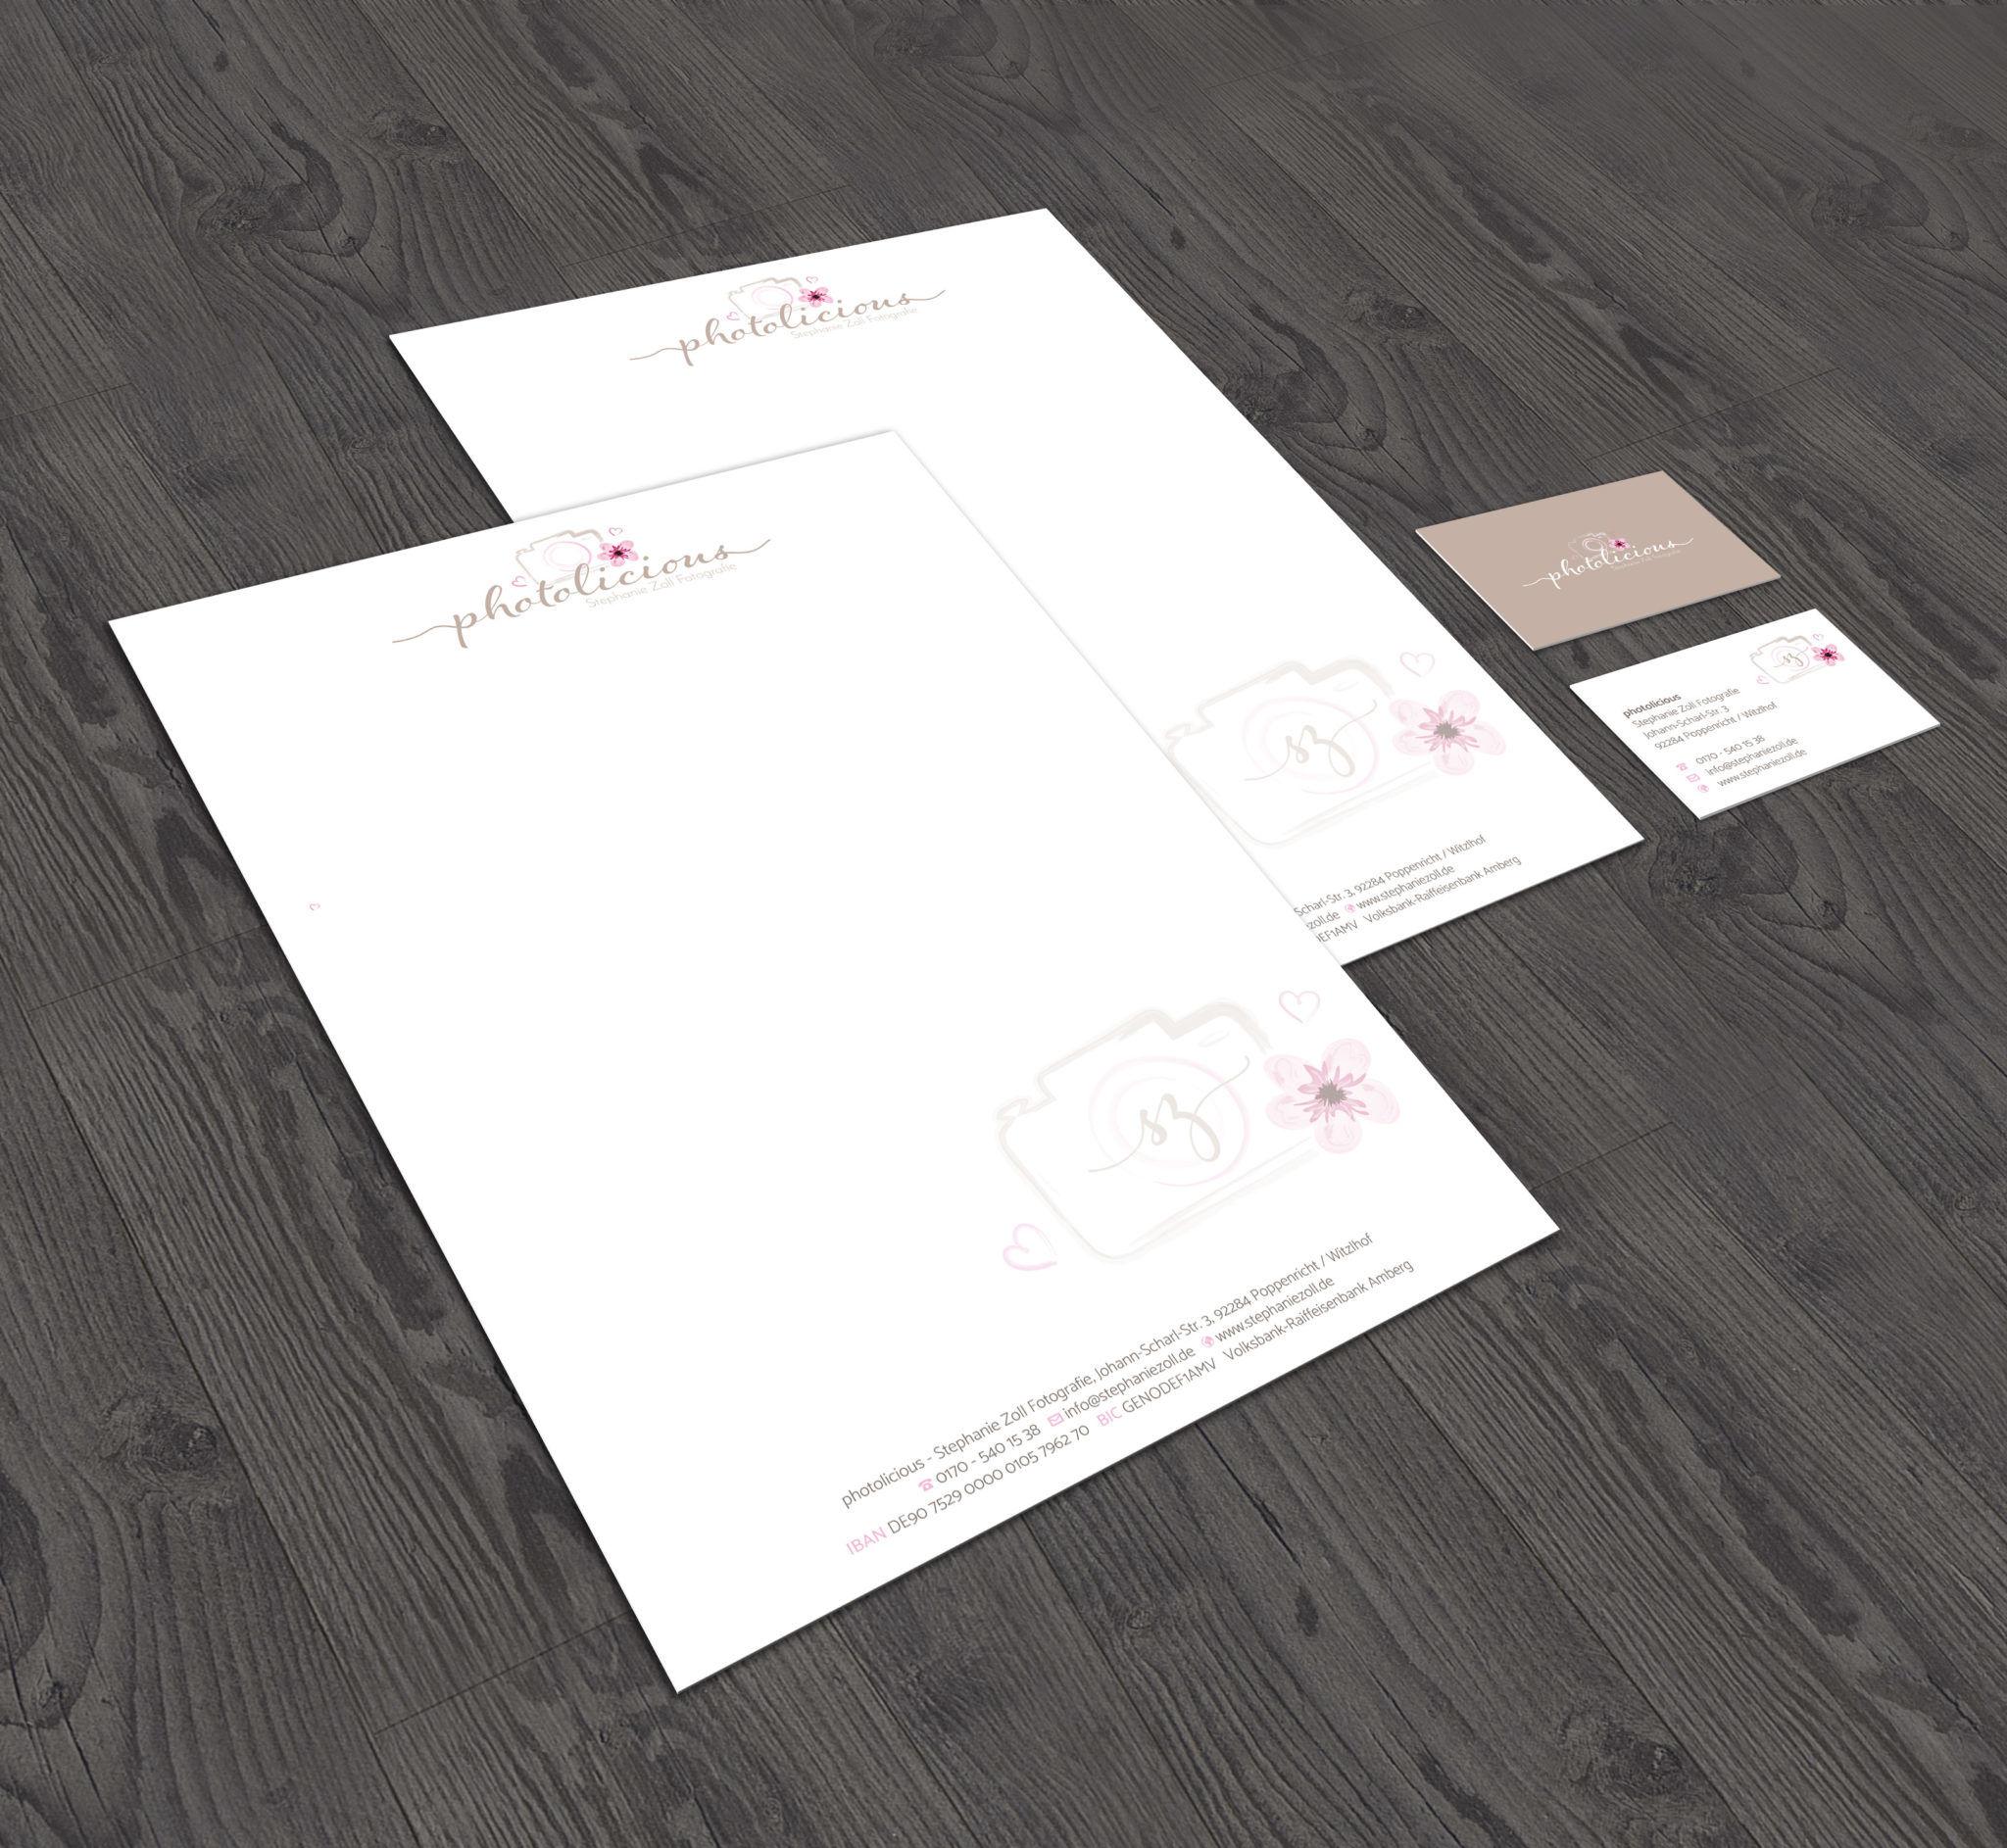 photolicious corporate design